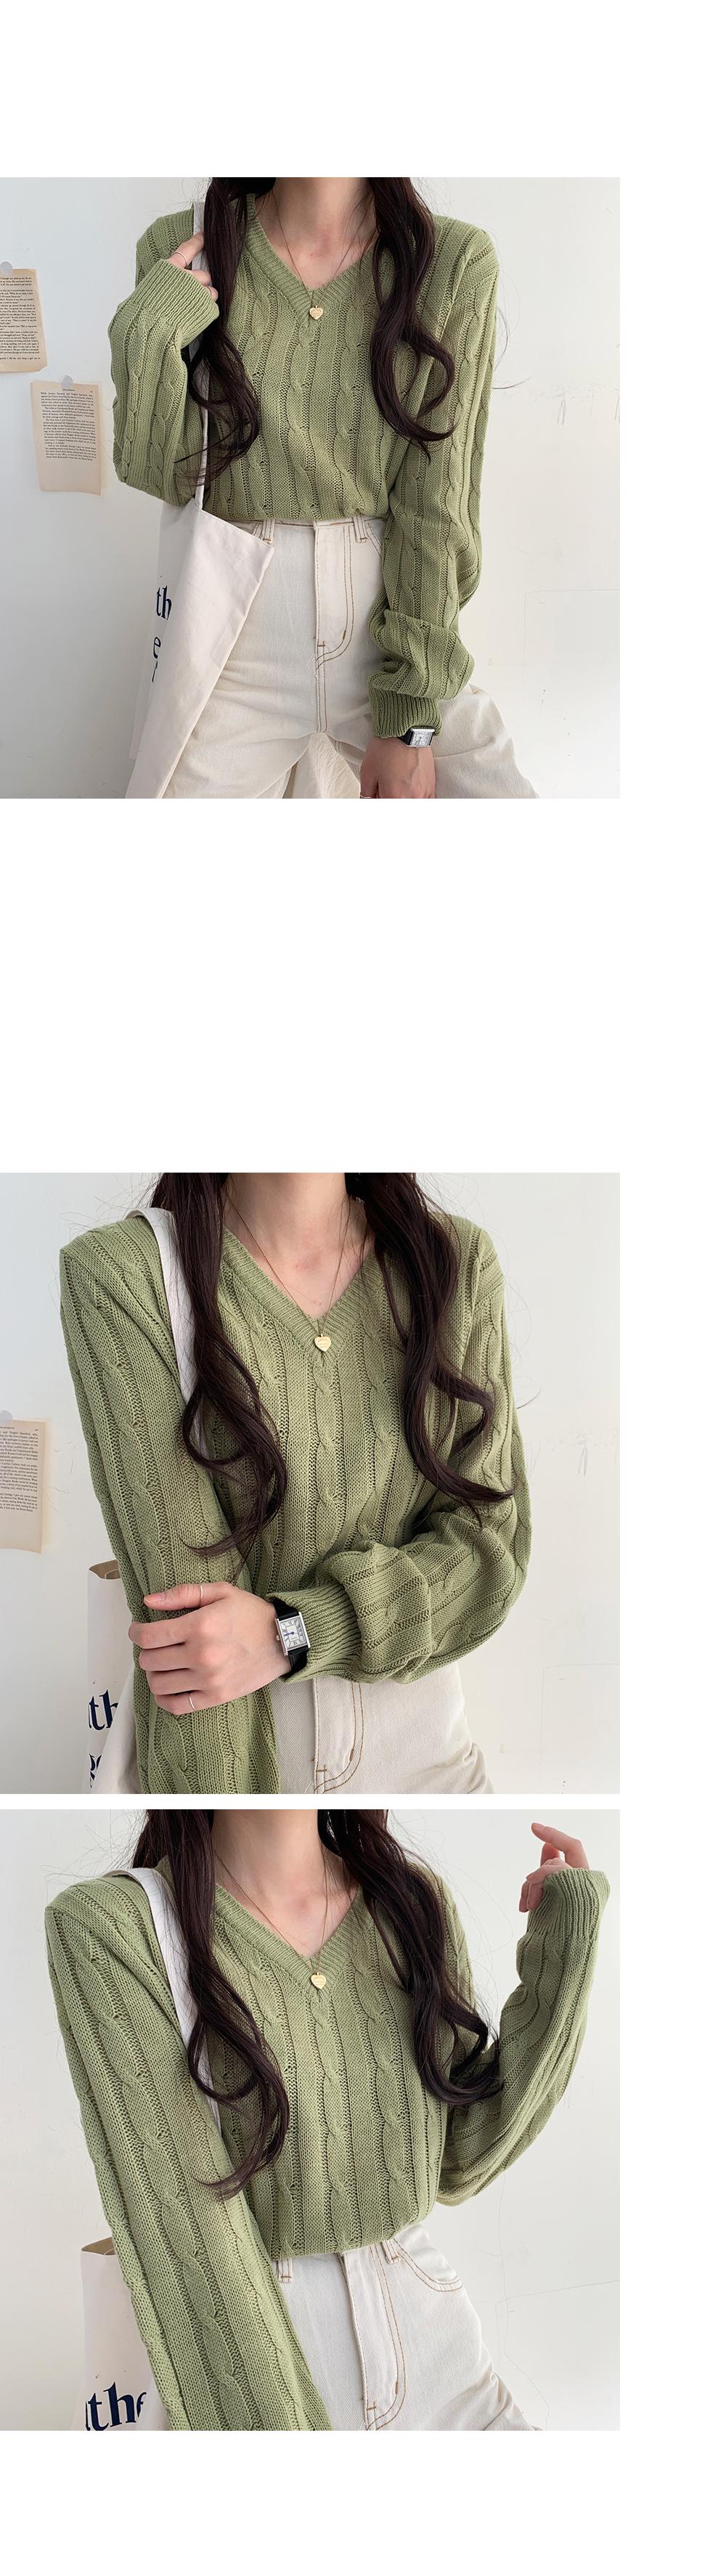 Low Twisted V-Neck Knitwear